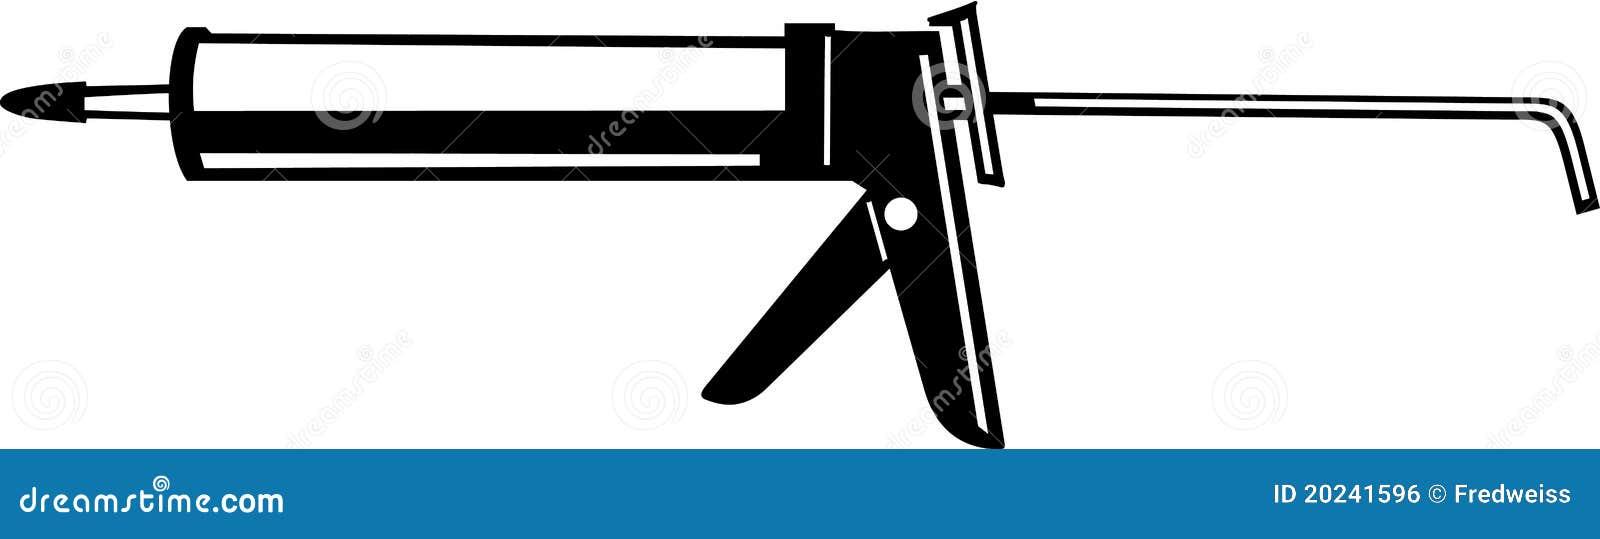 caulking gun stock vector illustration of construction line clip art free line clip art borders